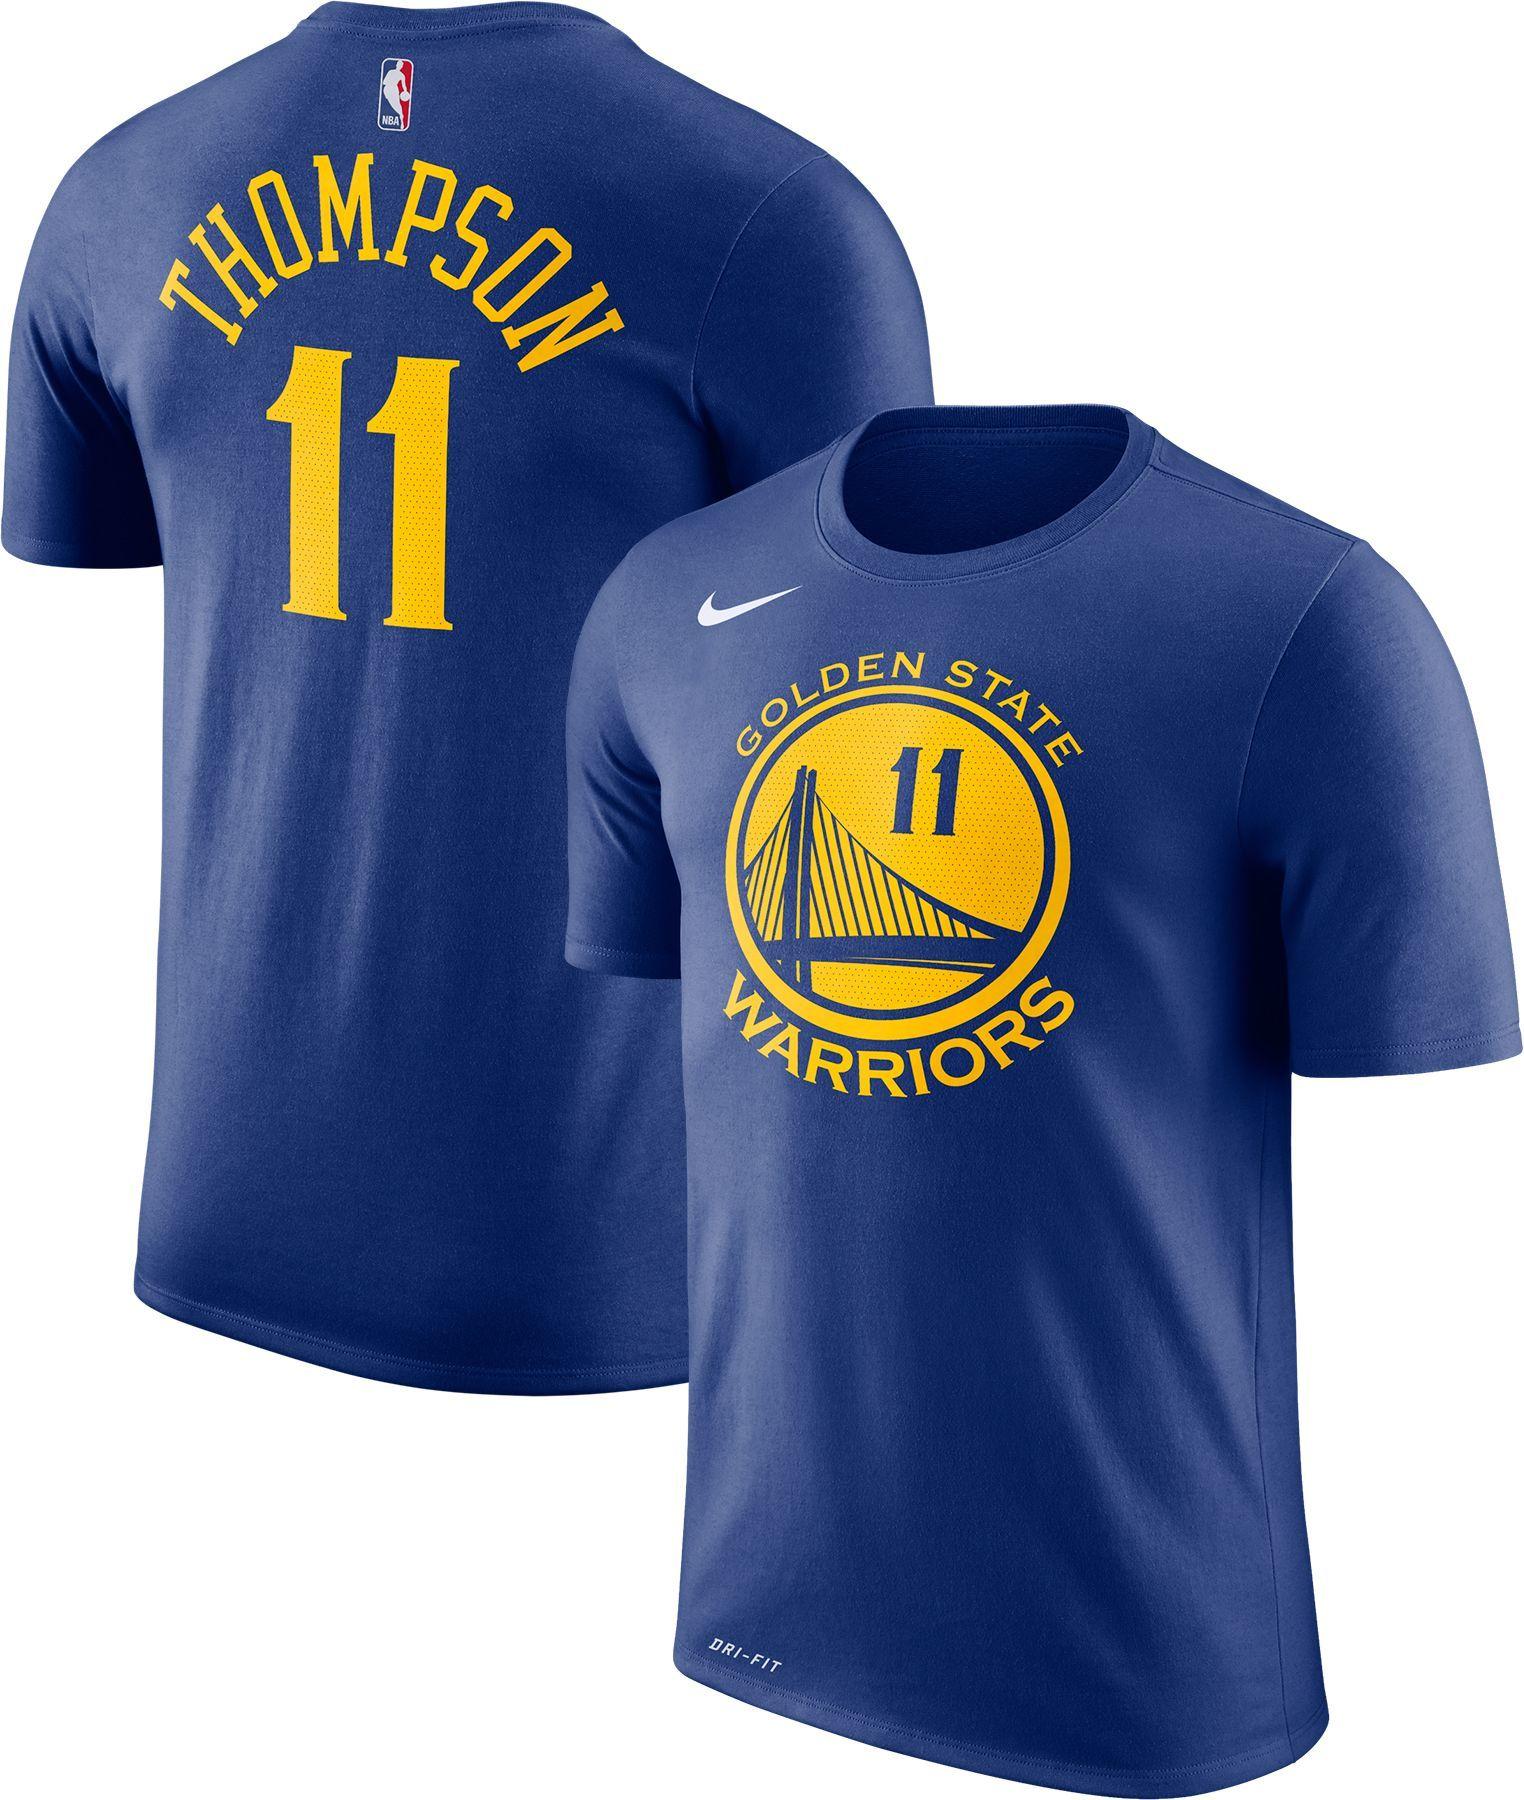 Nike Youth Golden State Warriors Klay Thompson  11 Dri-FIT Royal T-Shirt 3e580c7b9